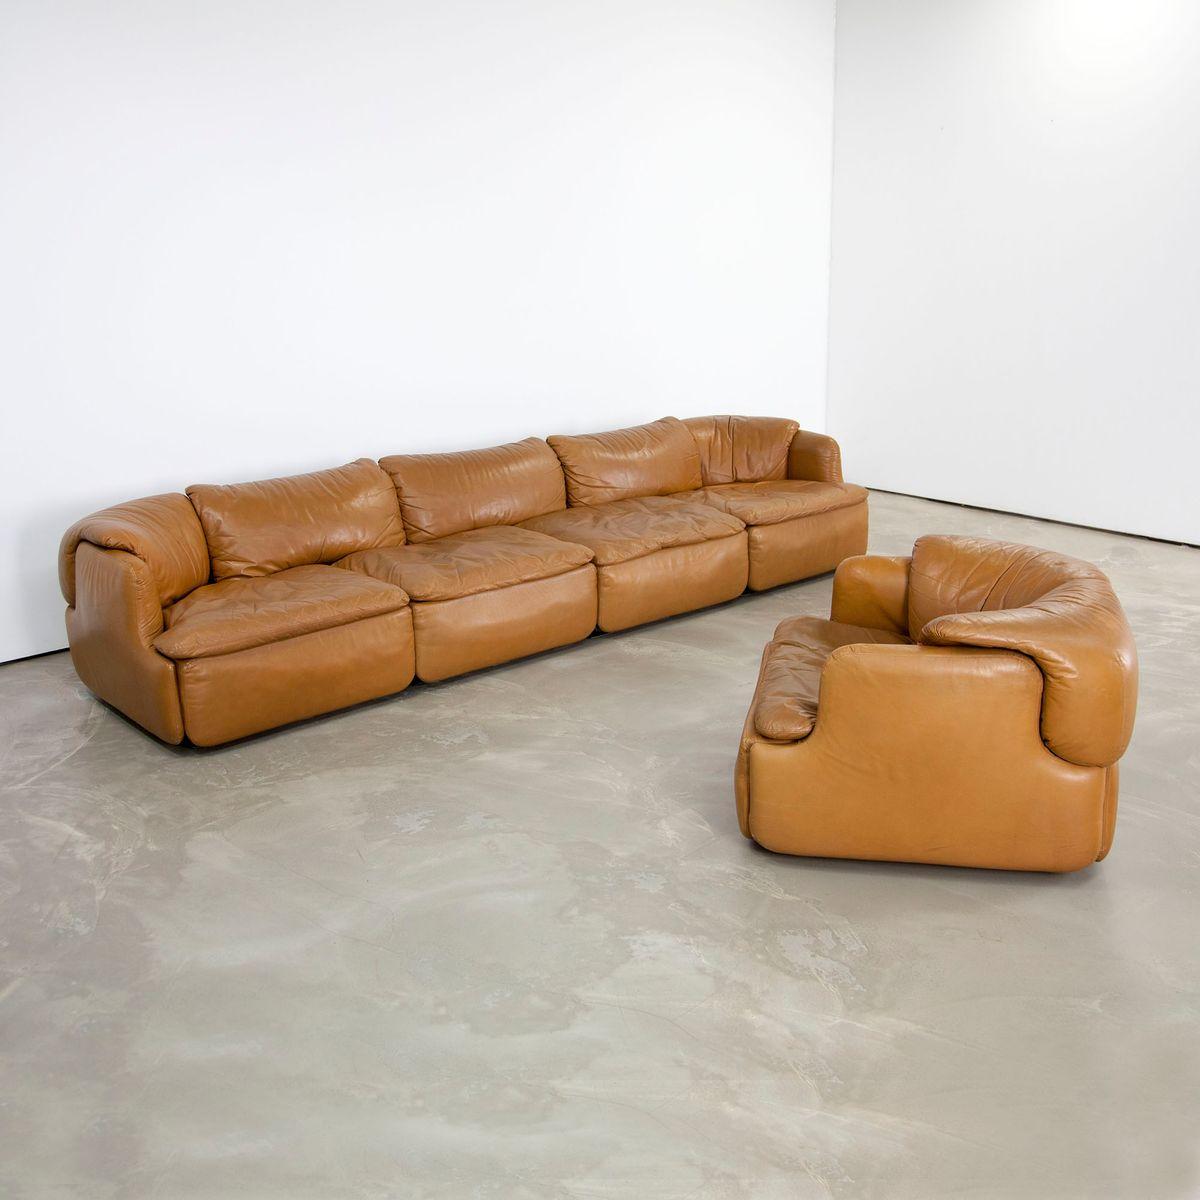 leder 4 sitzer sofa und sessel von alberto rosselli f r saporiti bei pamono kaufen. Black Bedroom Furniture Sets. Home Design Ideas